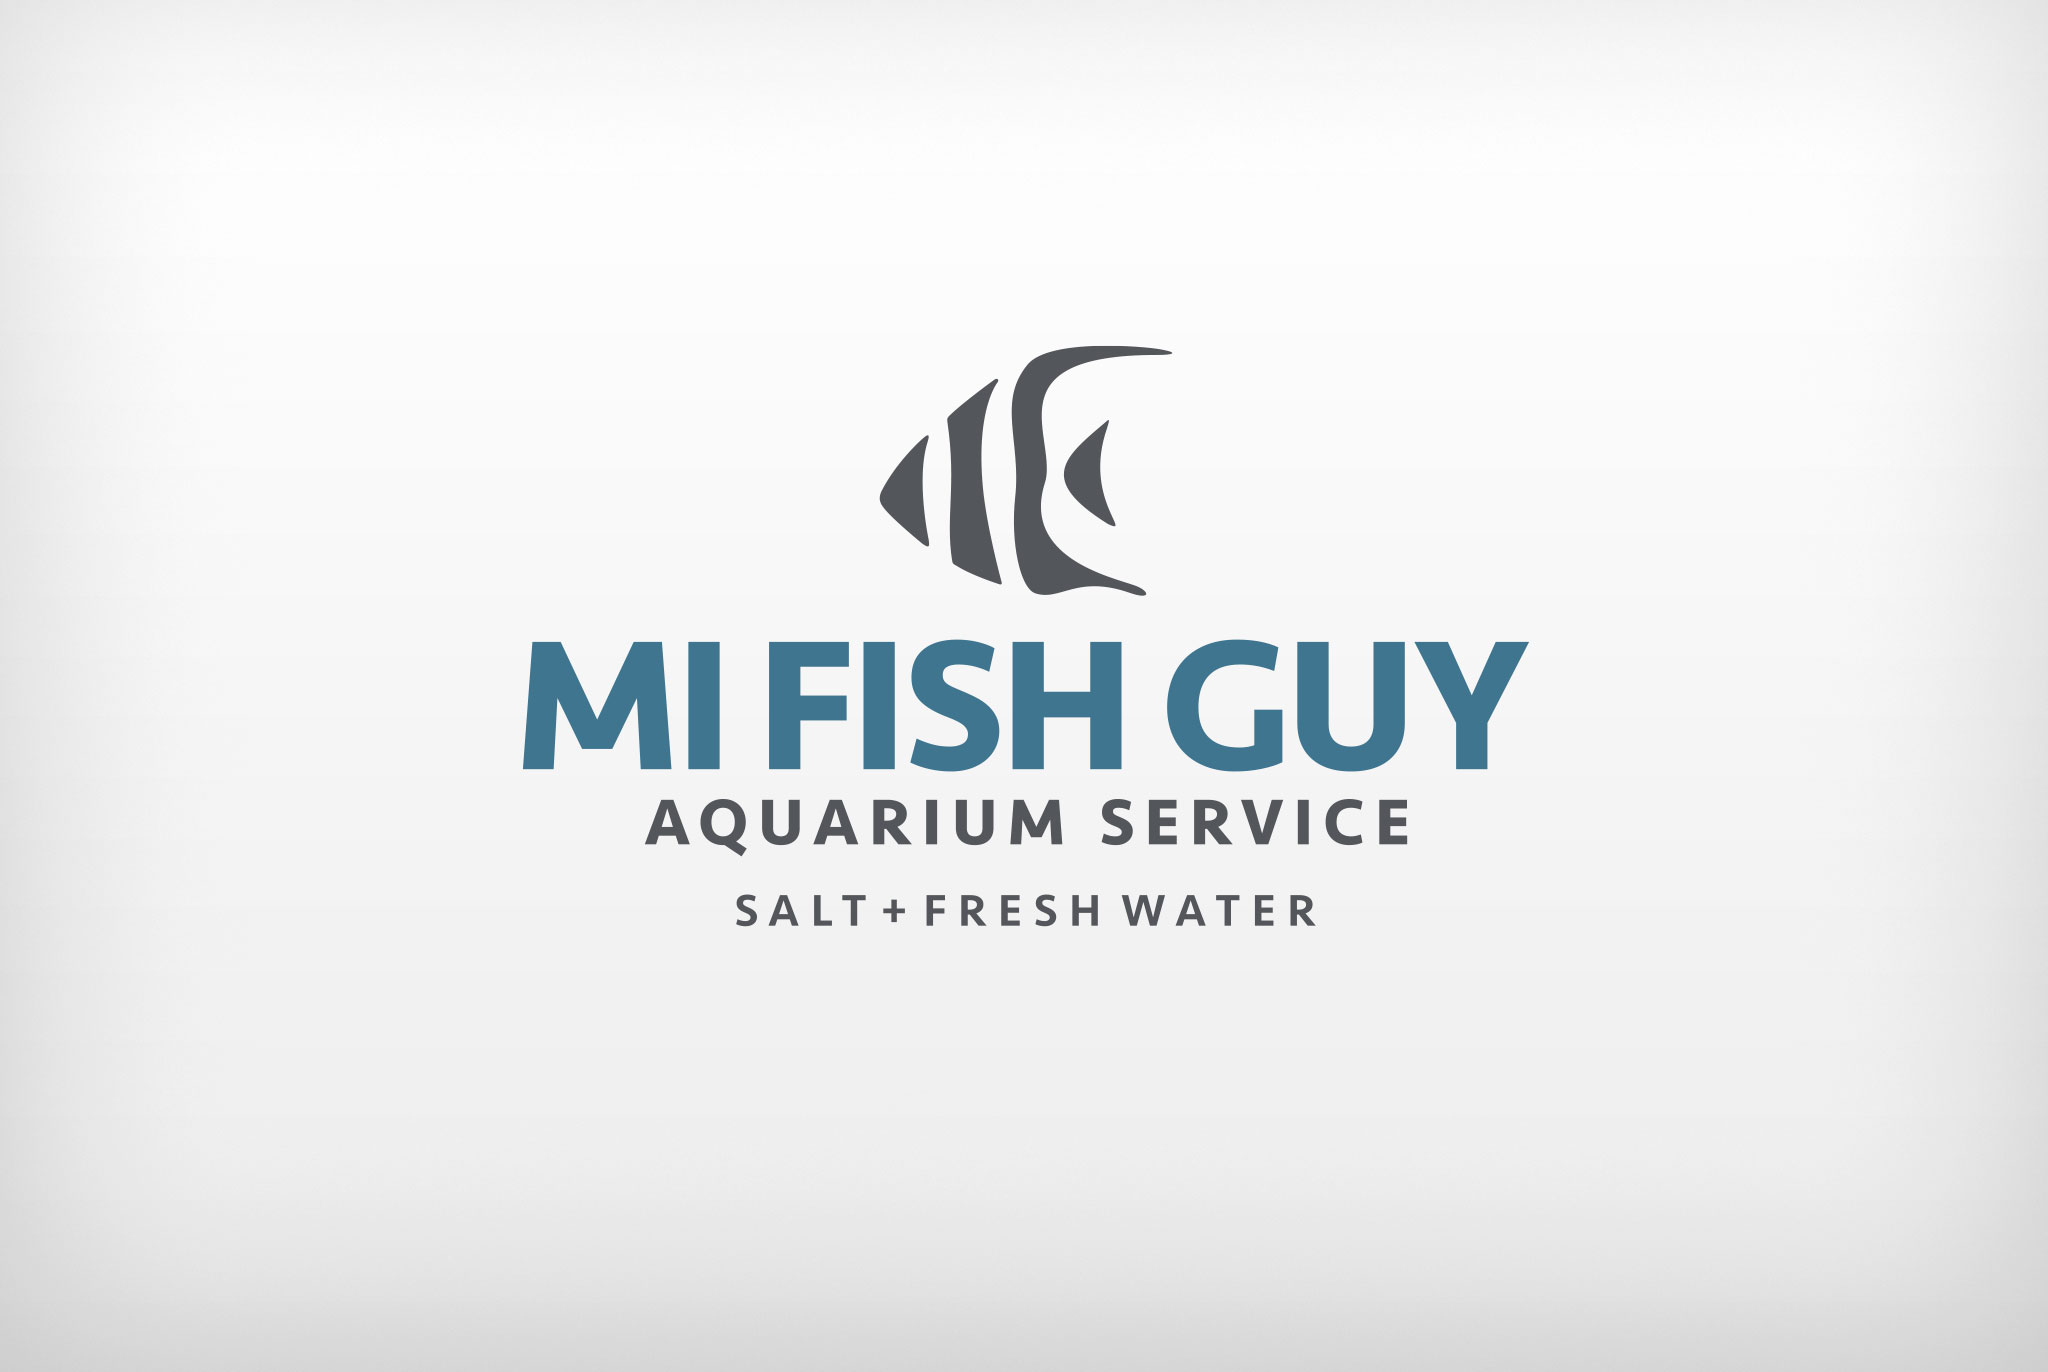 MI Fish Guy logo, logo design, branded logo, branding